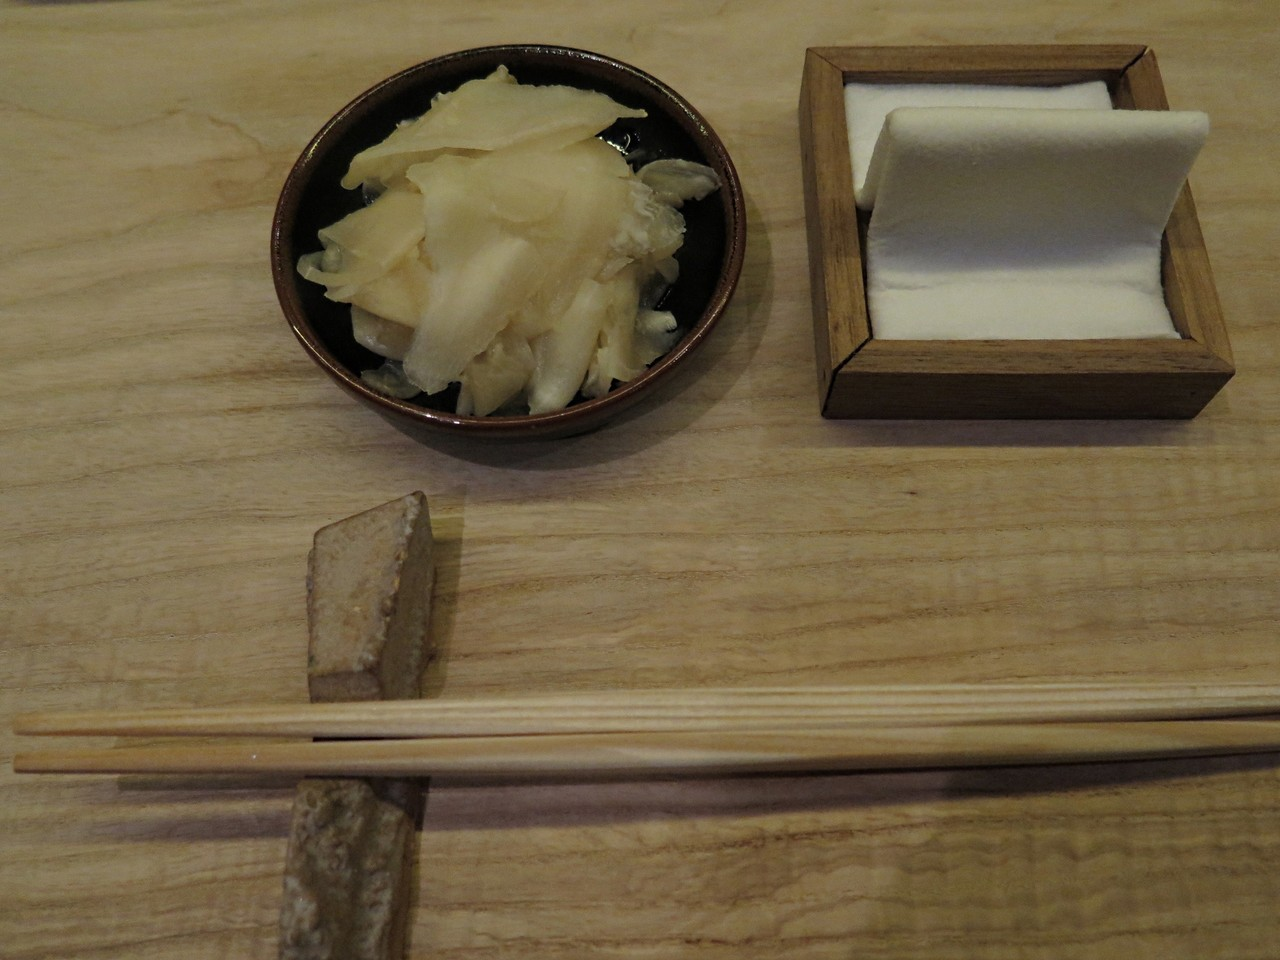 só gengibre, que a soja e o wasabi já vêm no sushi